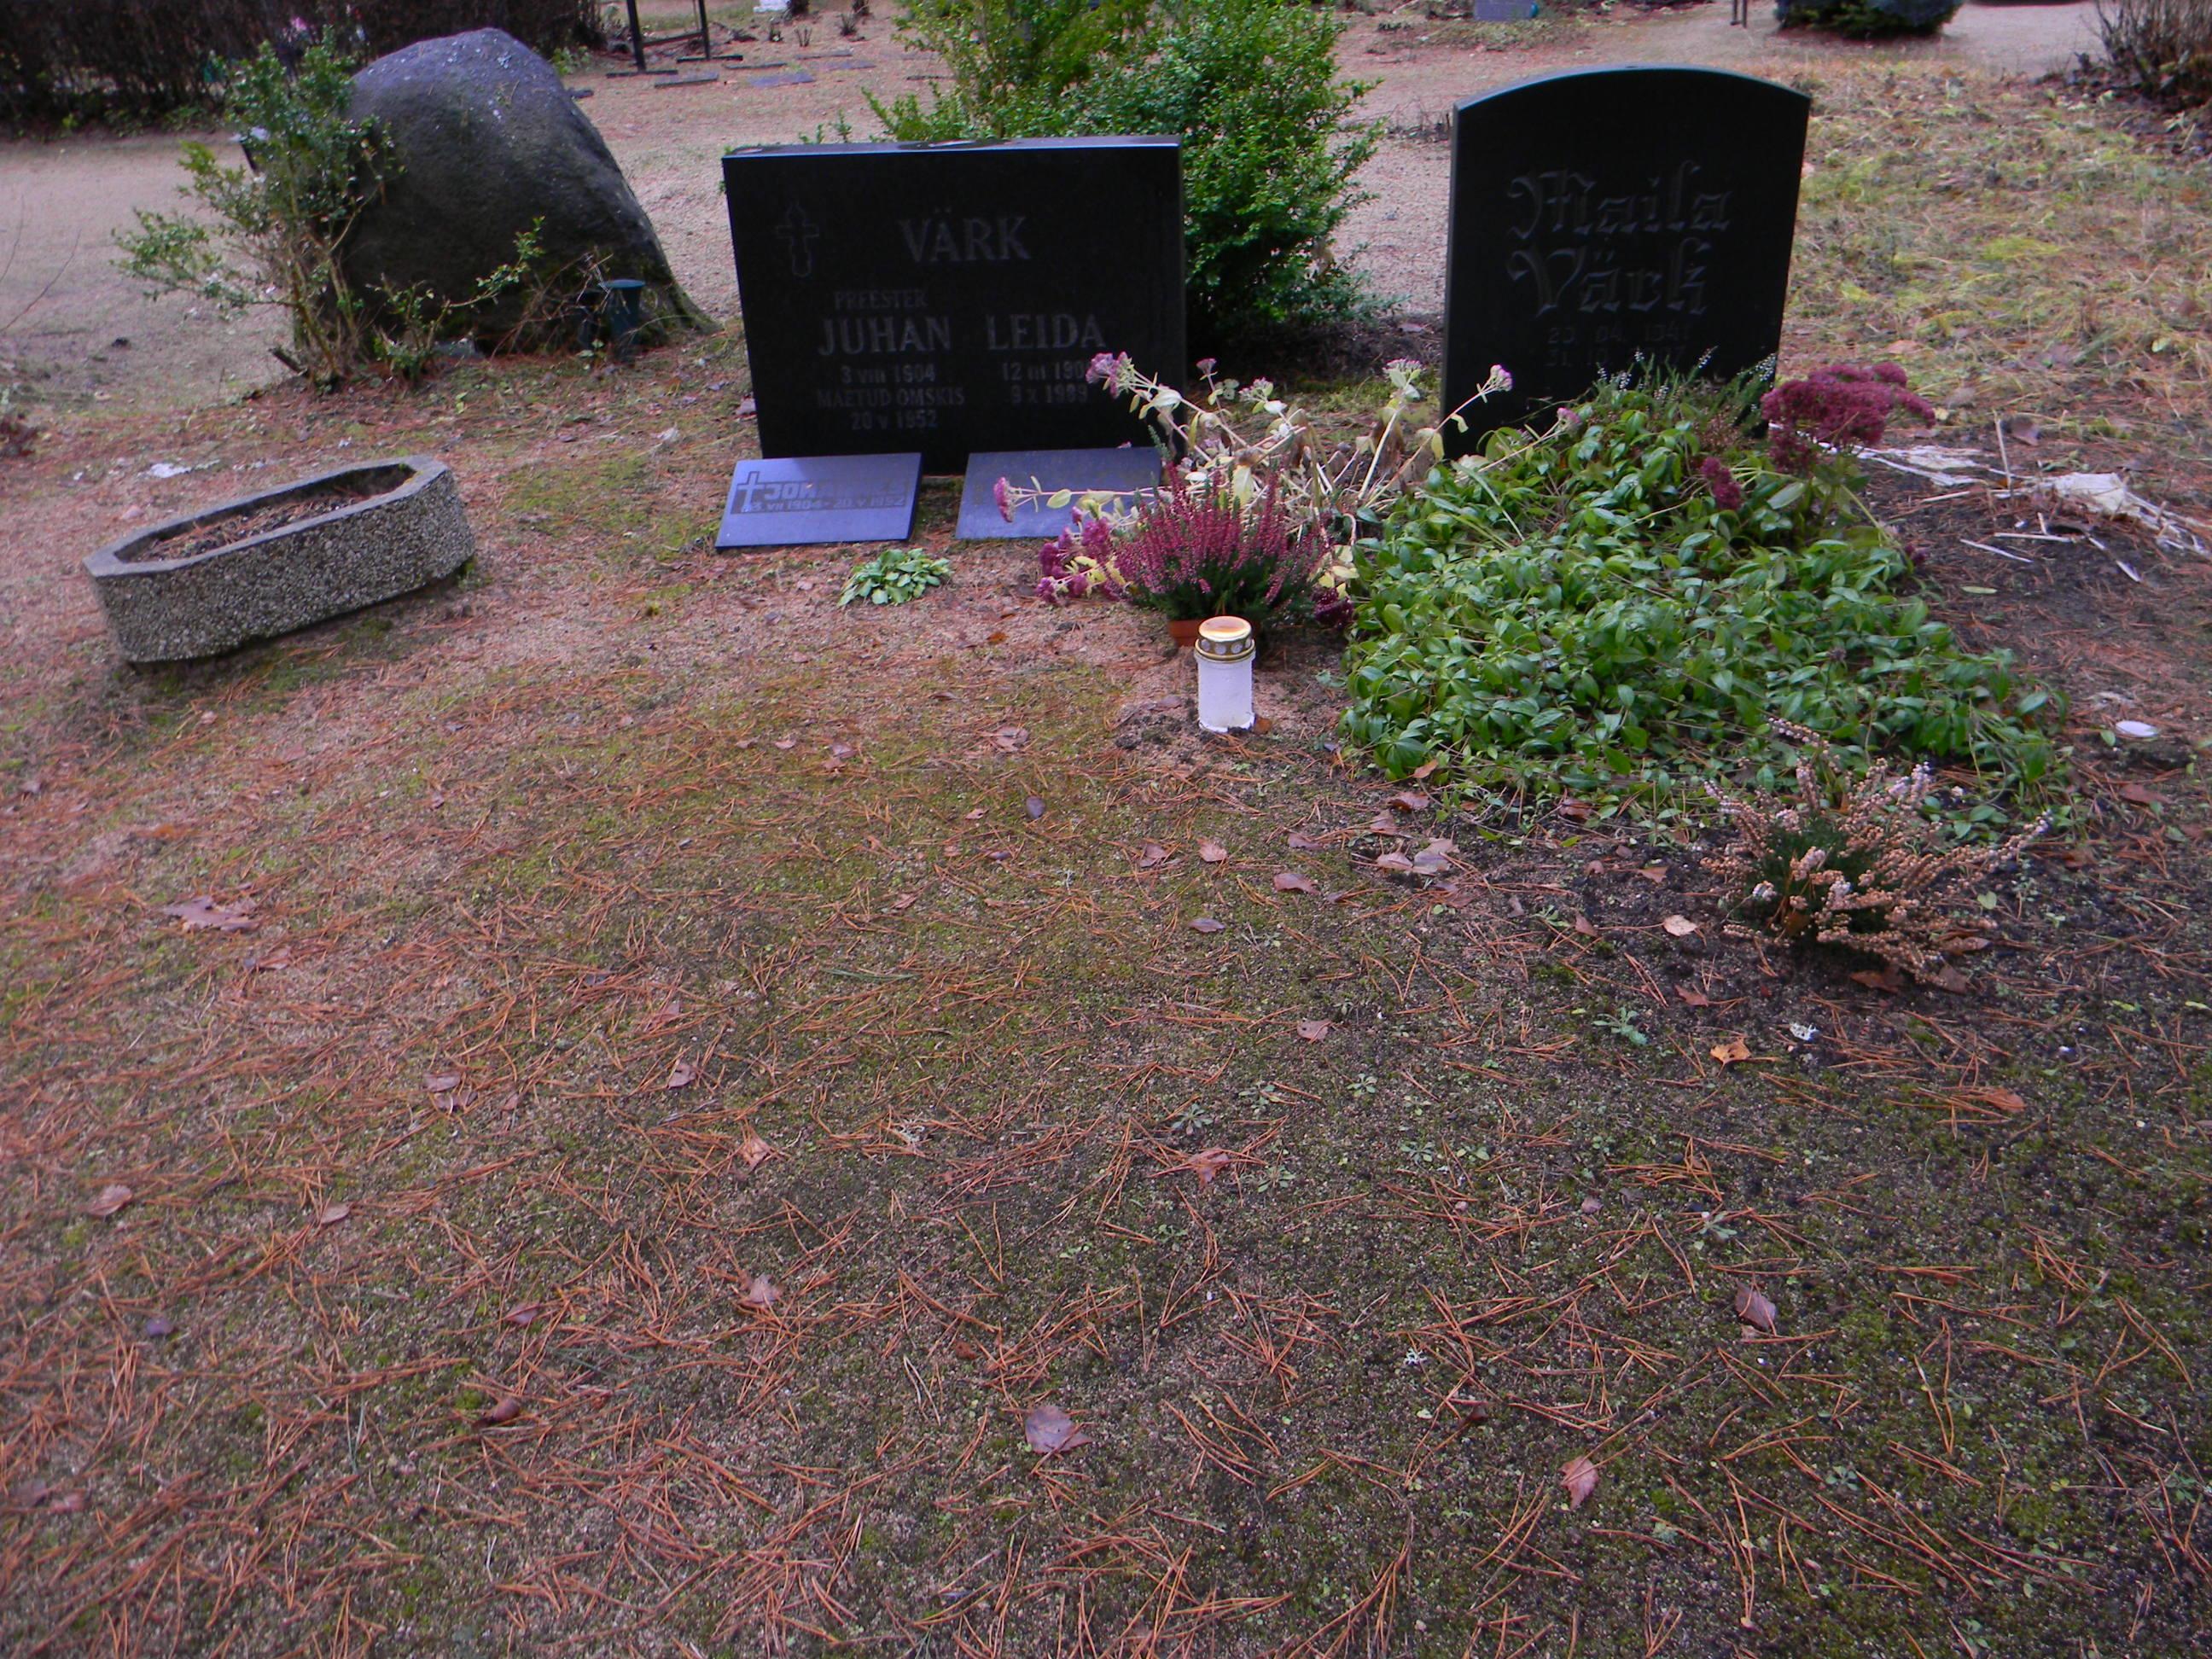 https://www.haudi.ee/uploads/burialplace_50aa0c7bd8b10.jpg